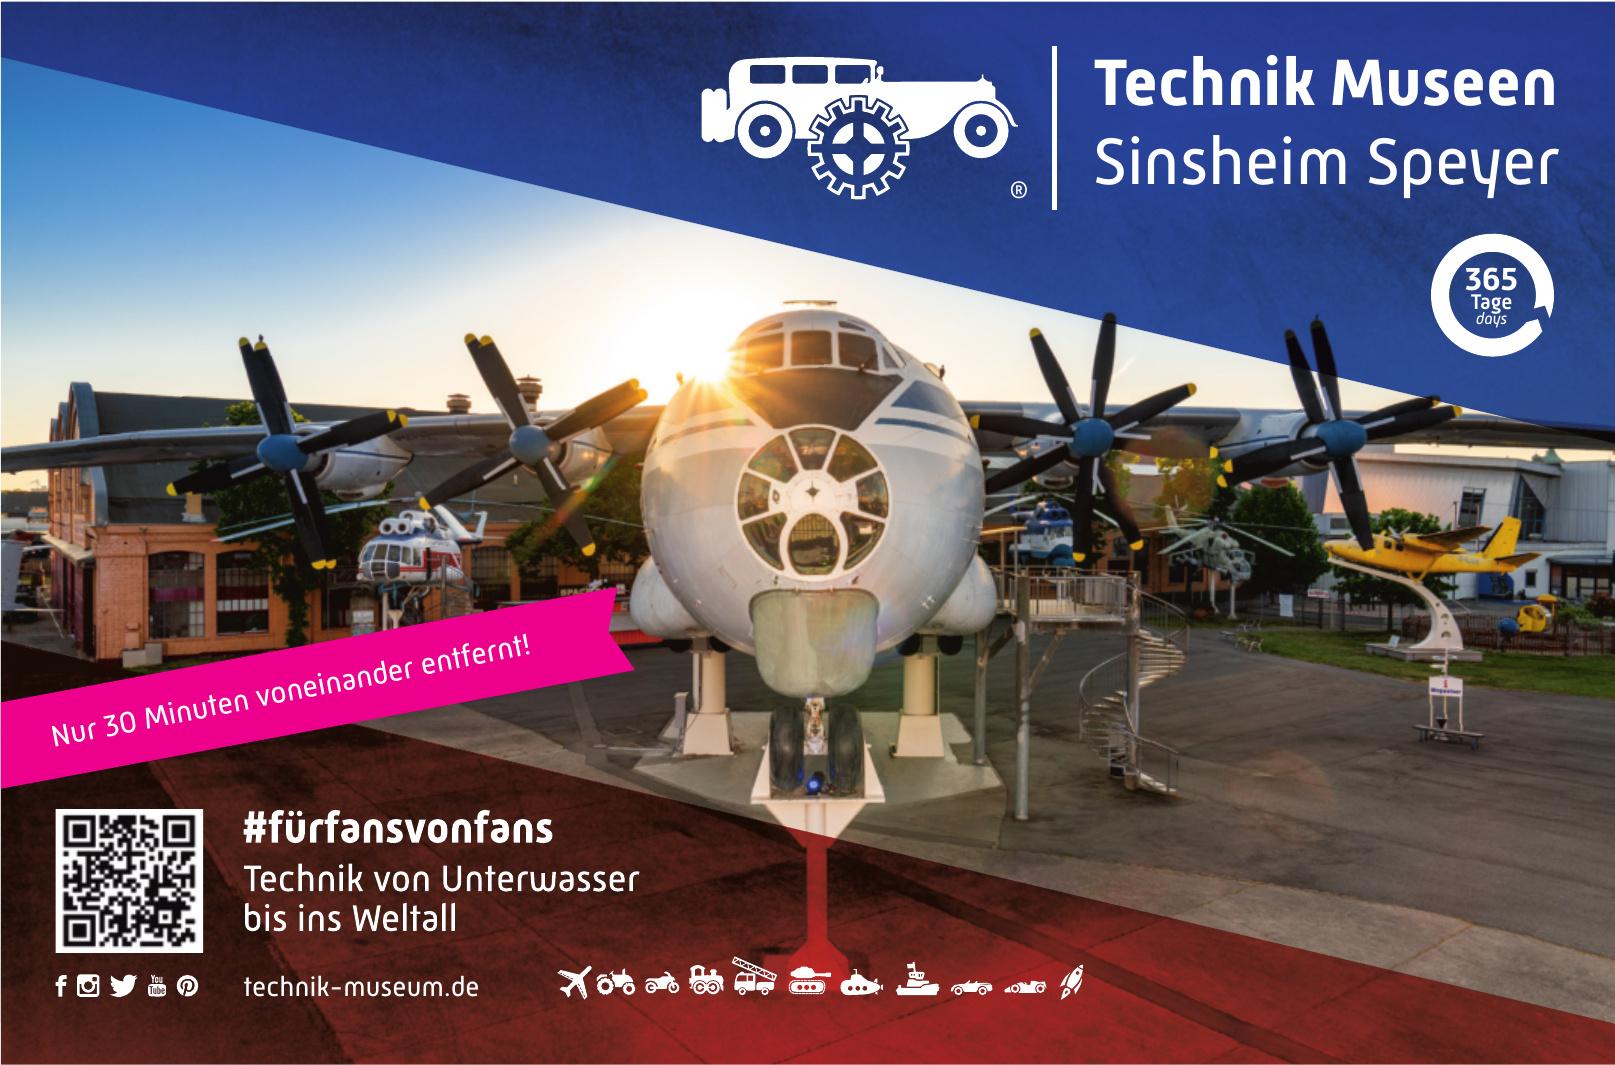 Technik Museen Sinsheim Speyer